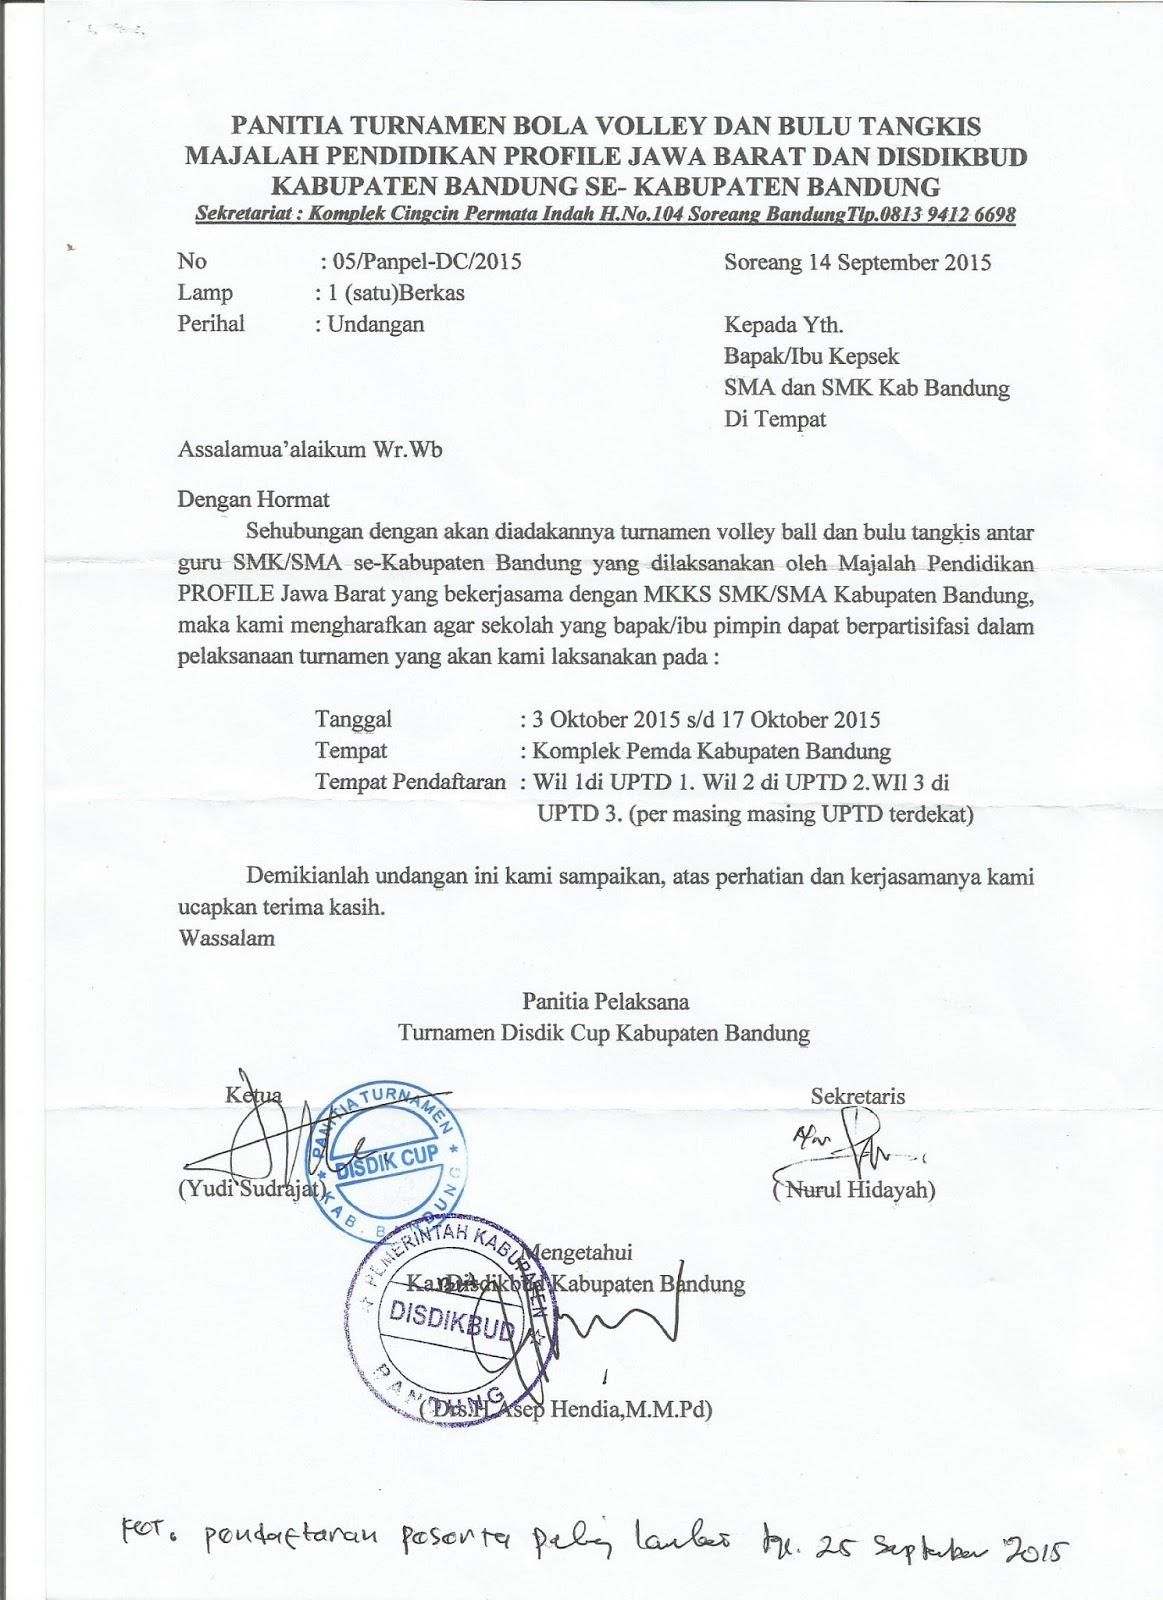 K3s Smk Kab Bandung Bulu Tangkis Bola Voli Disdik Cup Anatar